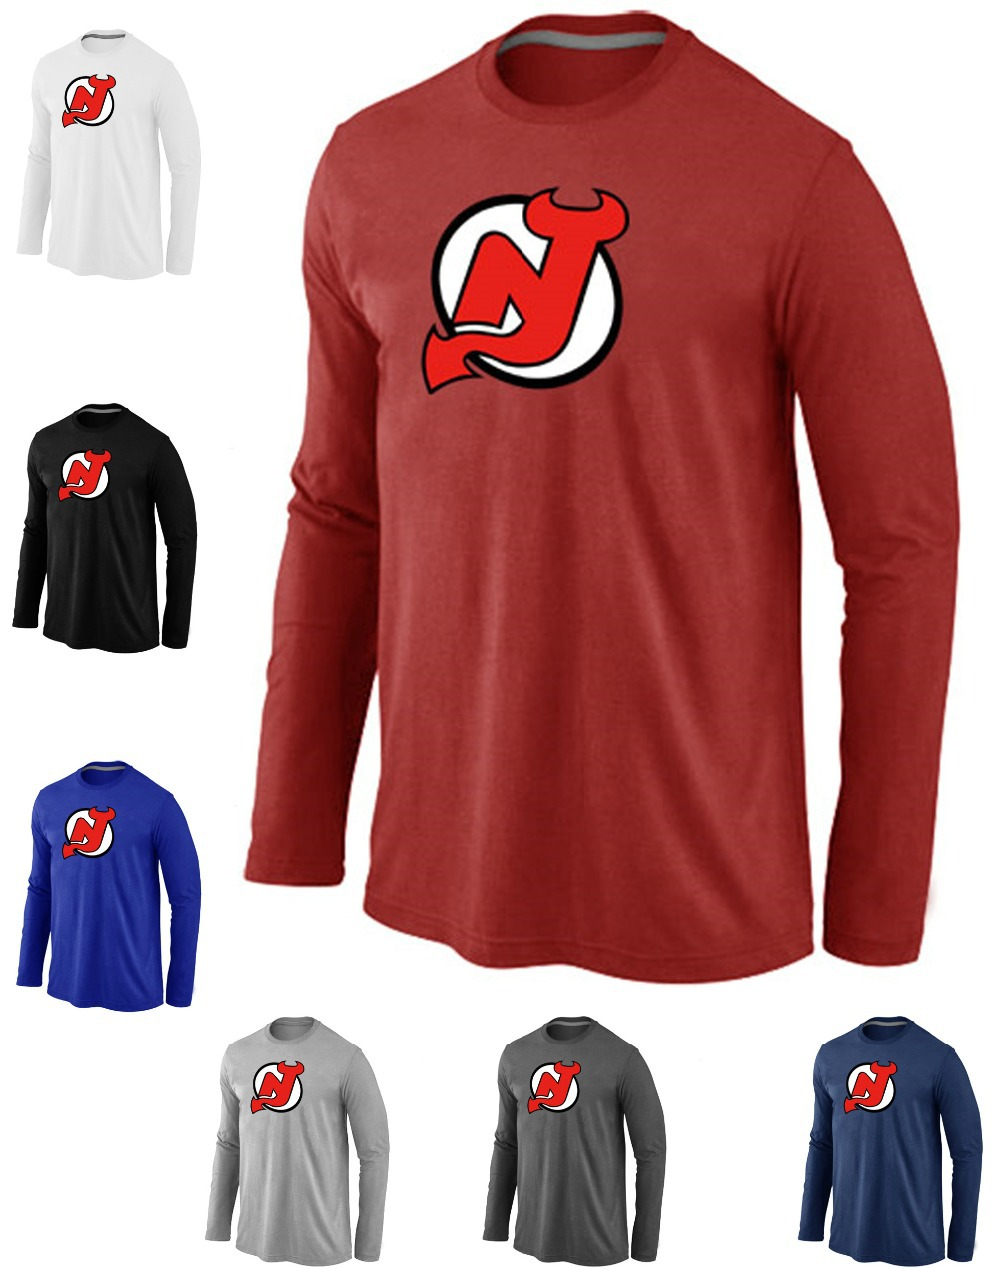 Cheap New Jersey Devils Hockey Long Sleeve T Shirts Big&Tall Logo Fashion Devils Hockey Tees Shirt Cotton O-Neck T-shirt(China (Mainland))